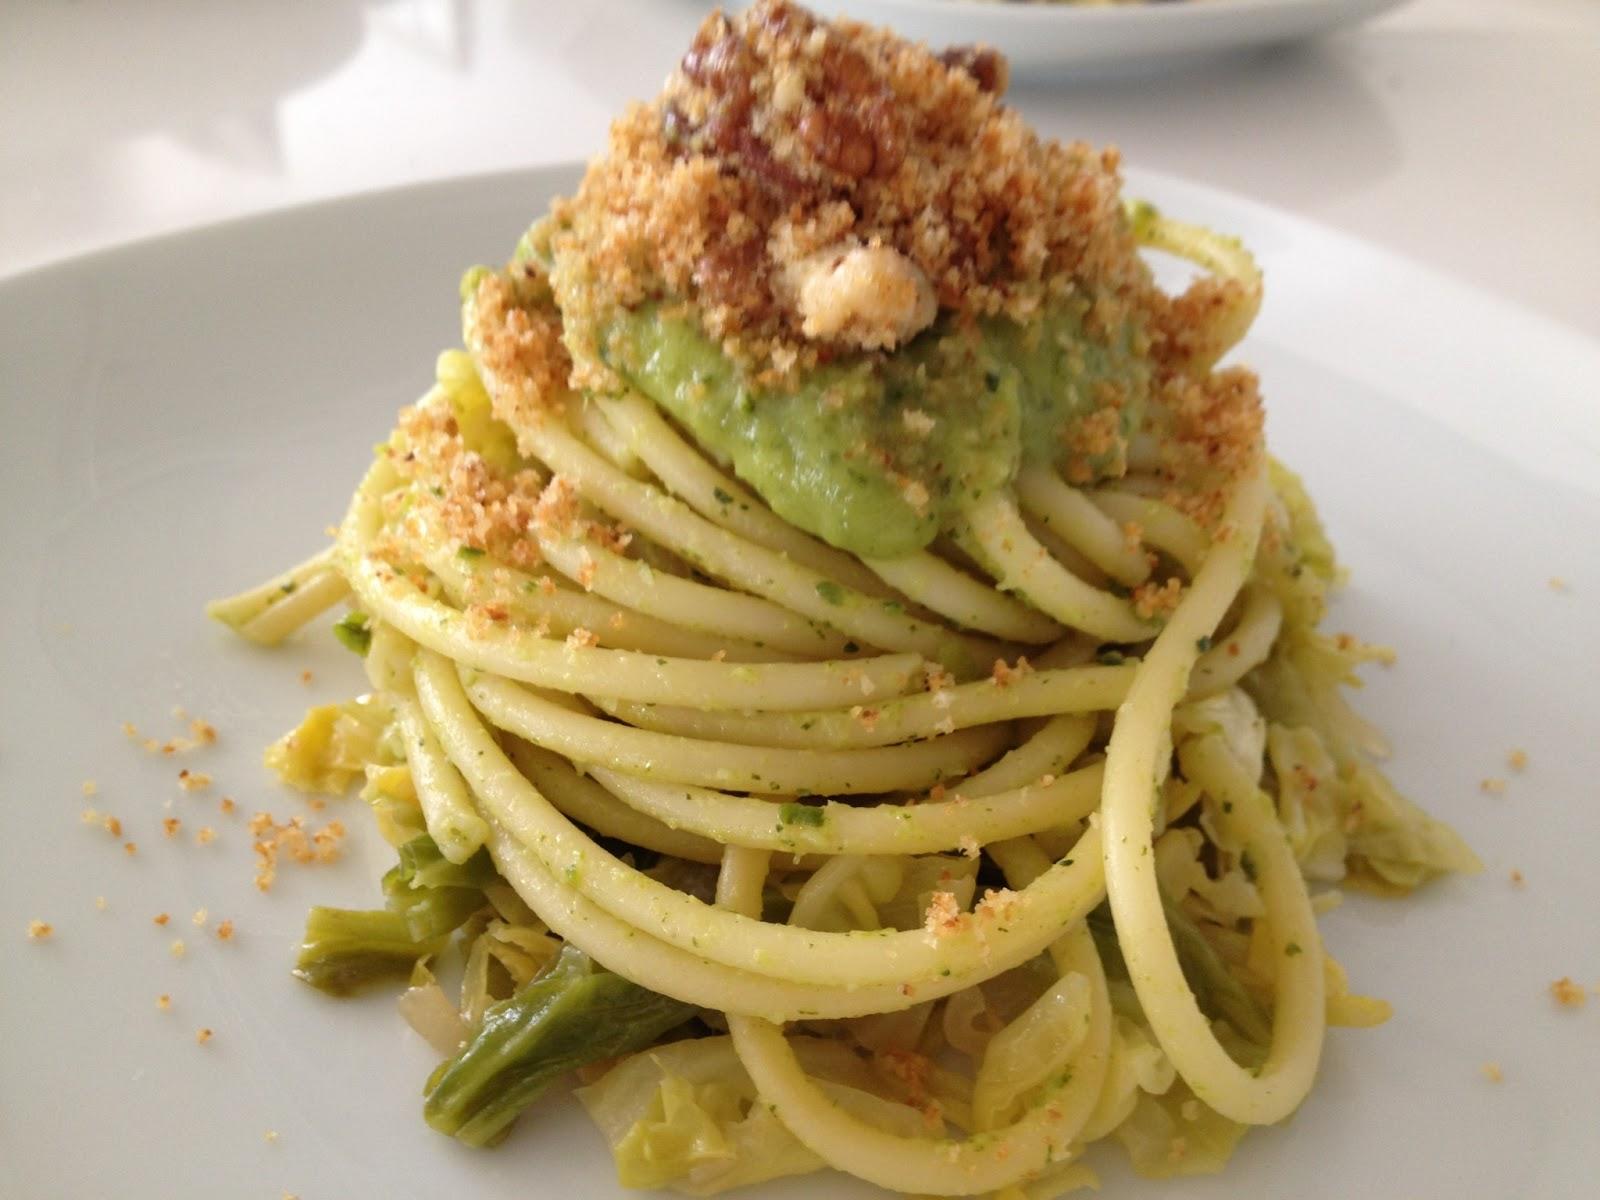 Tacco 12 in cucina spaghettoni alla crema di zucchine for Ricette in cucina